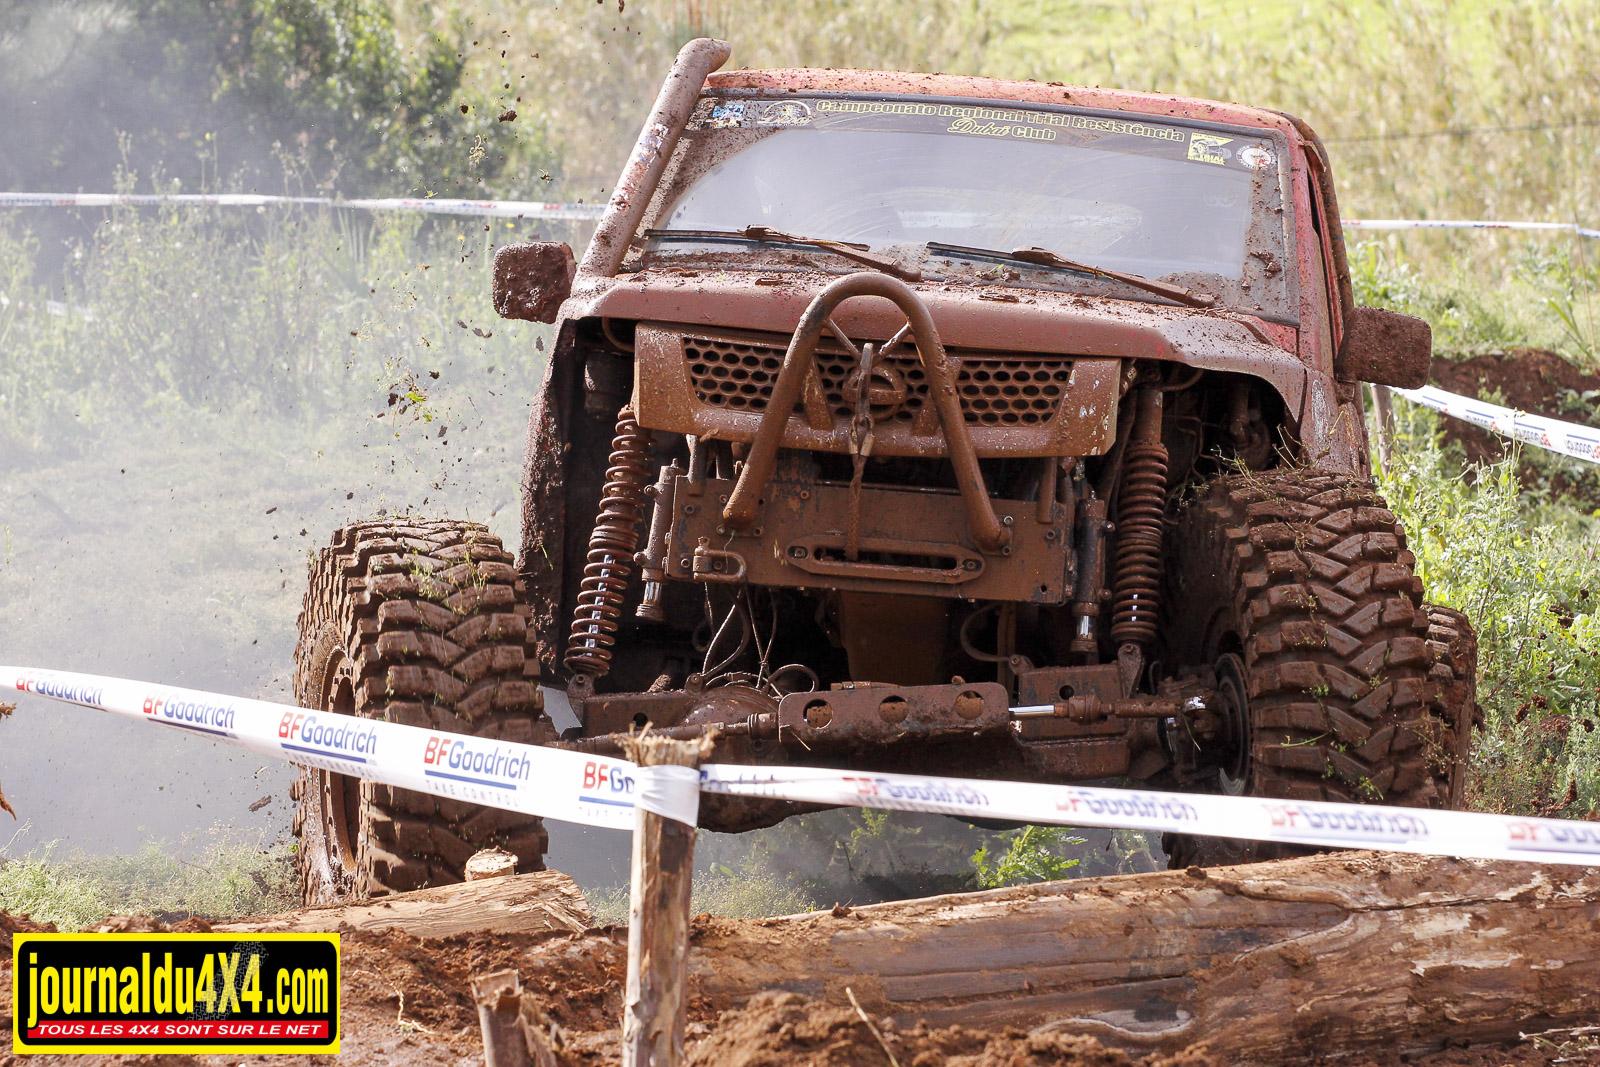 Auto Palmeira - 4th place 'Extreme' Class